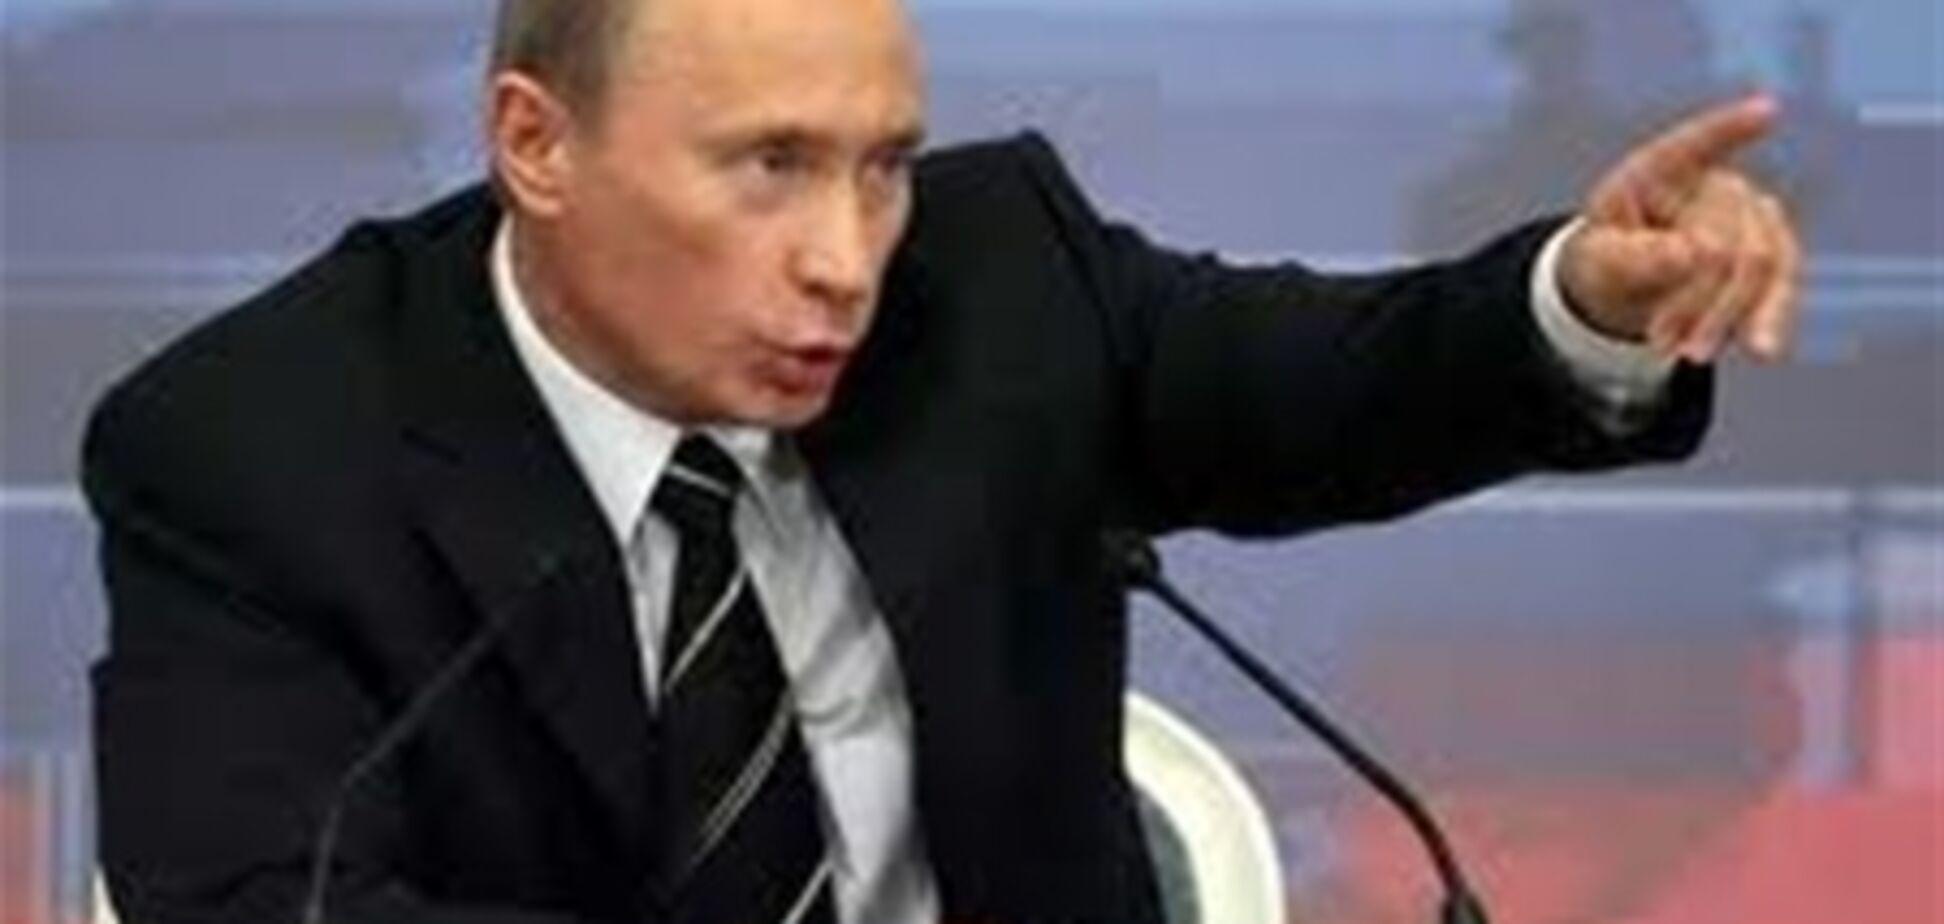 LIVE. Путин продемонстрировал свою Монику Левински. ВИДЕО